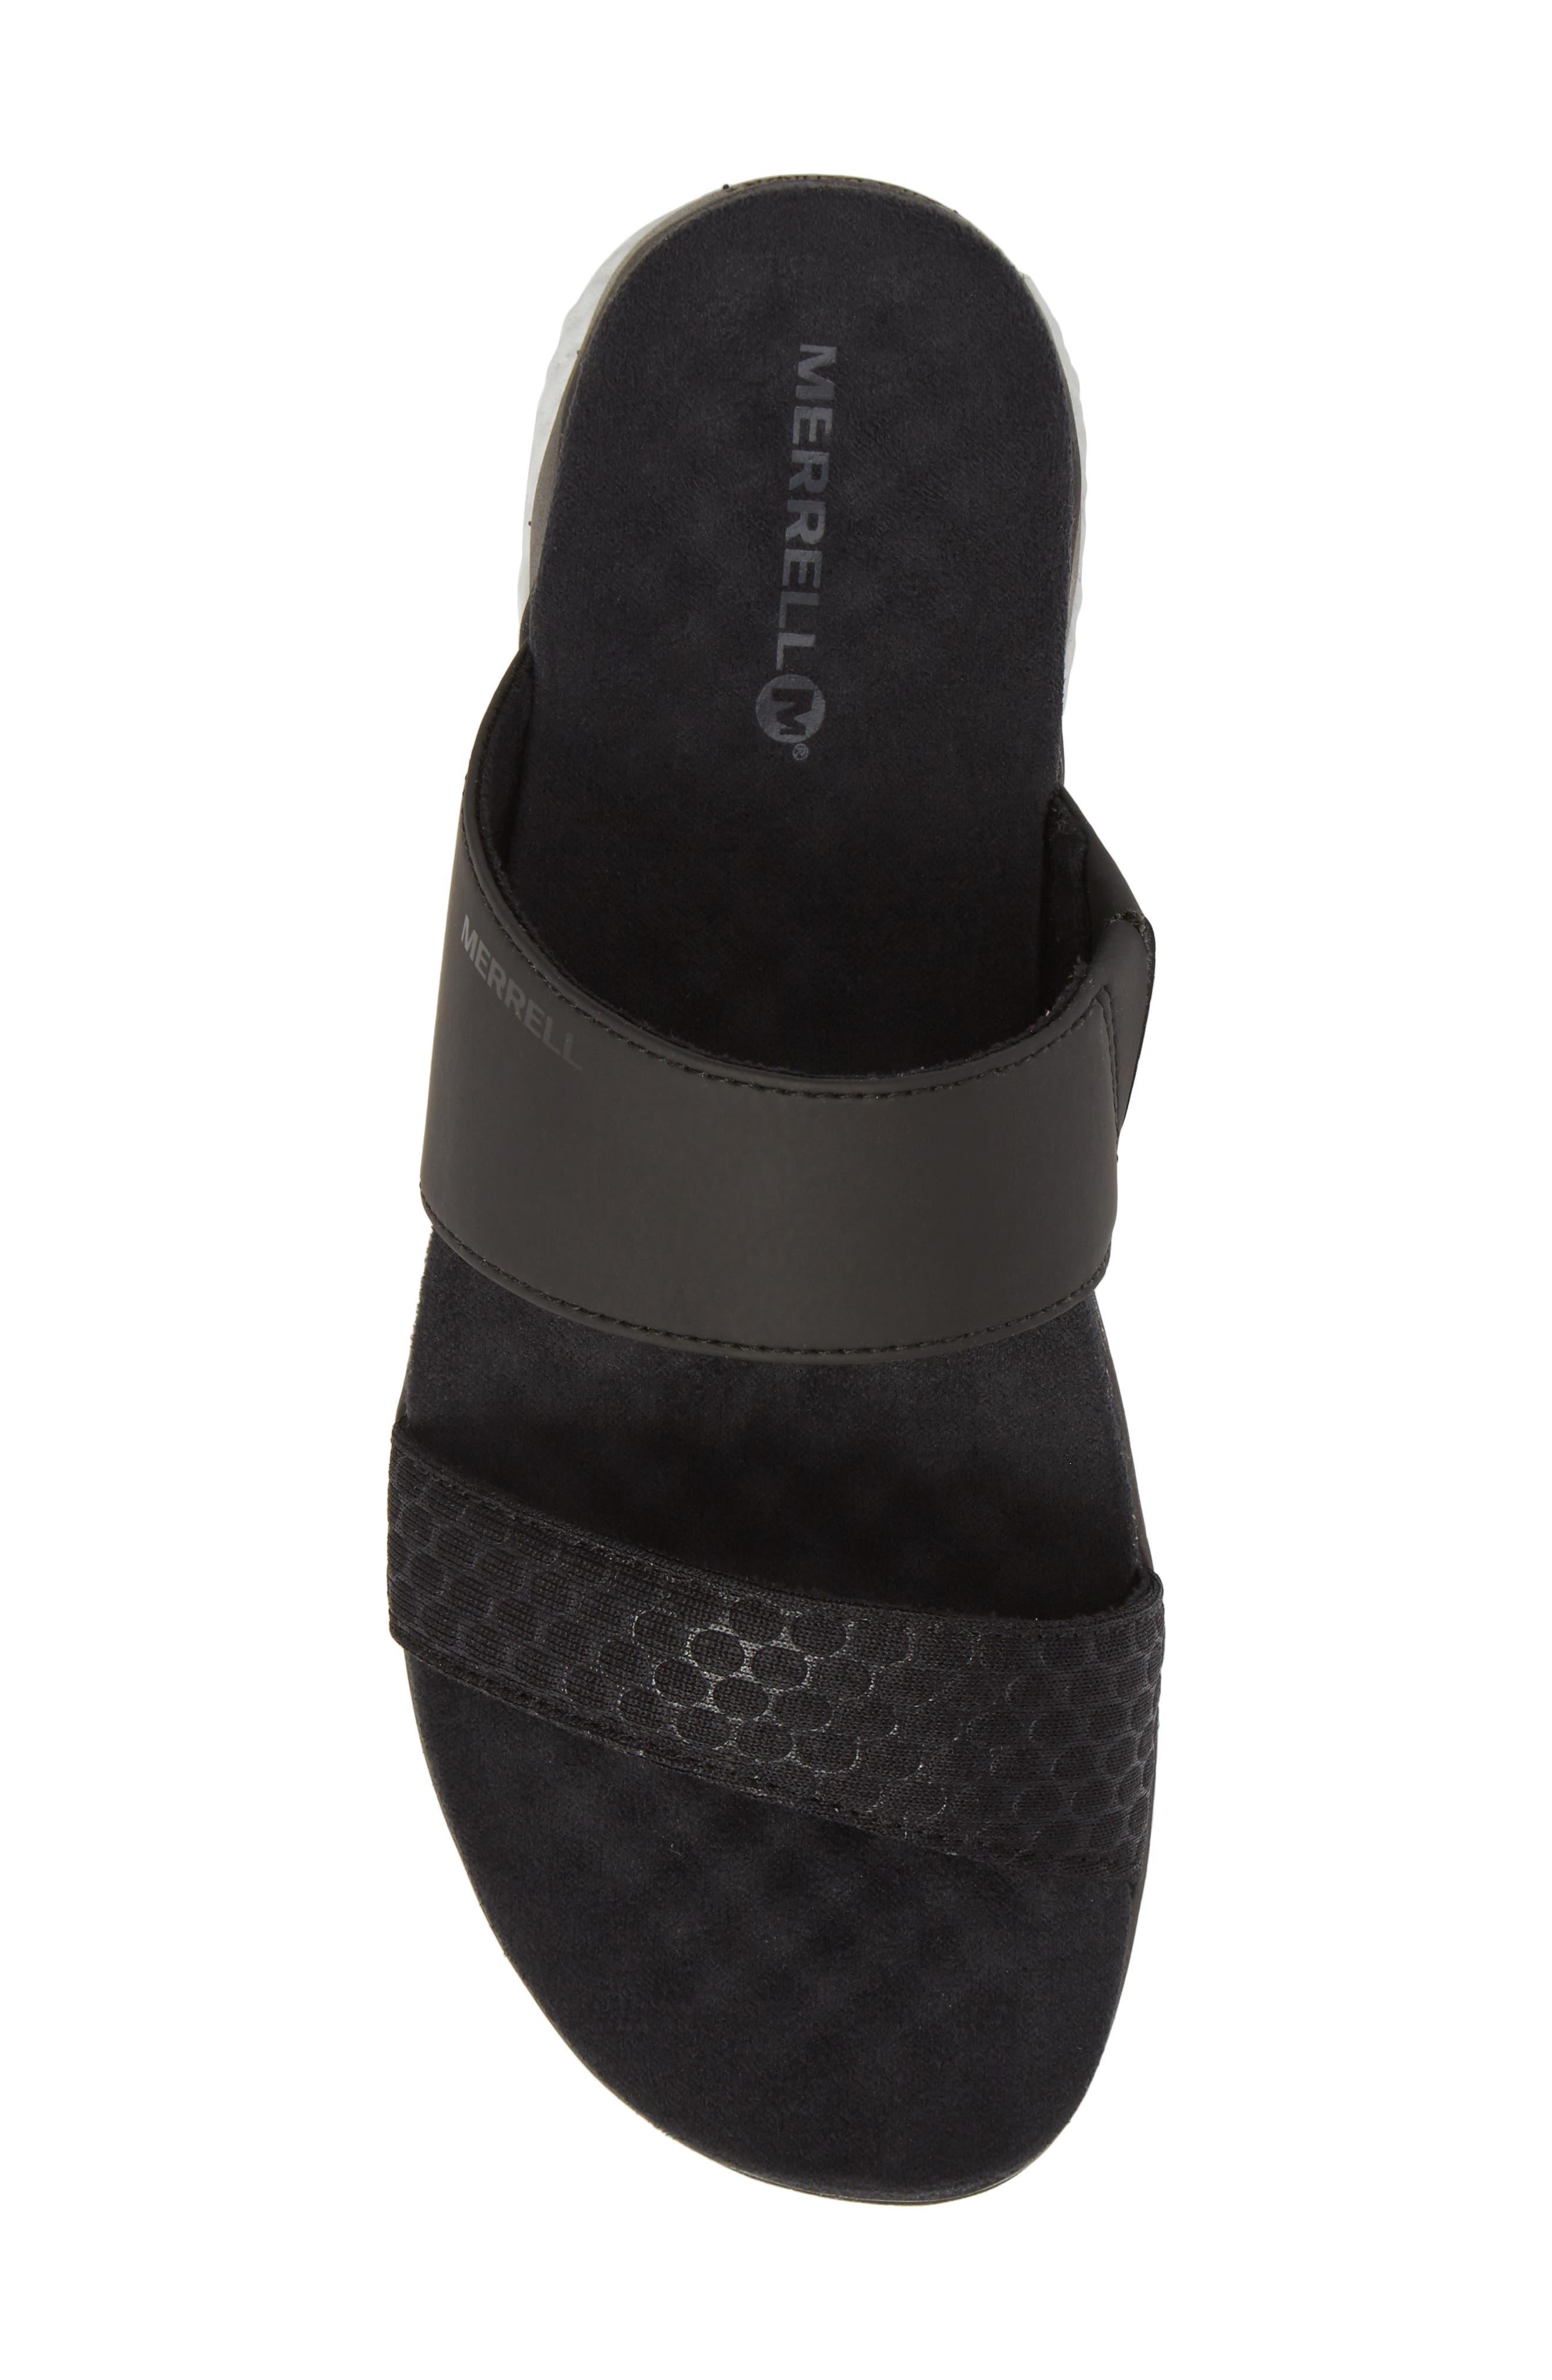 1SIX8 Linna Air Cushion+ Slide Sandal,                             Alternate thumbnail 17, color,